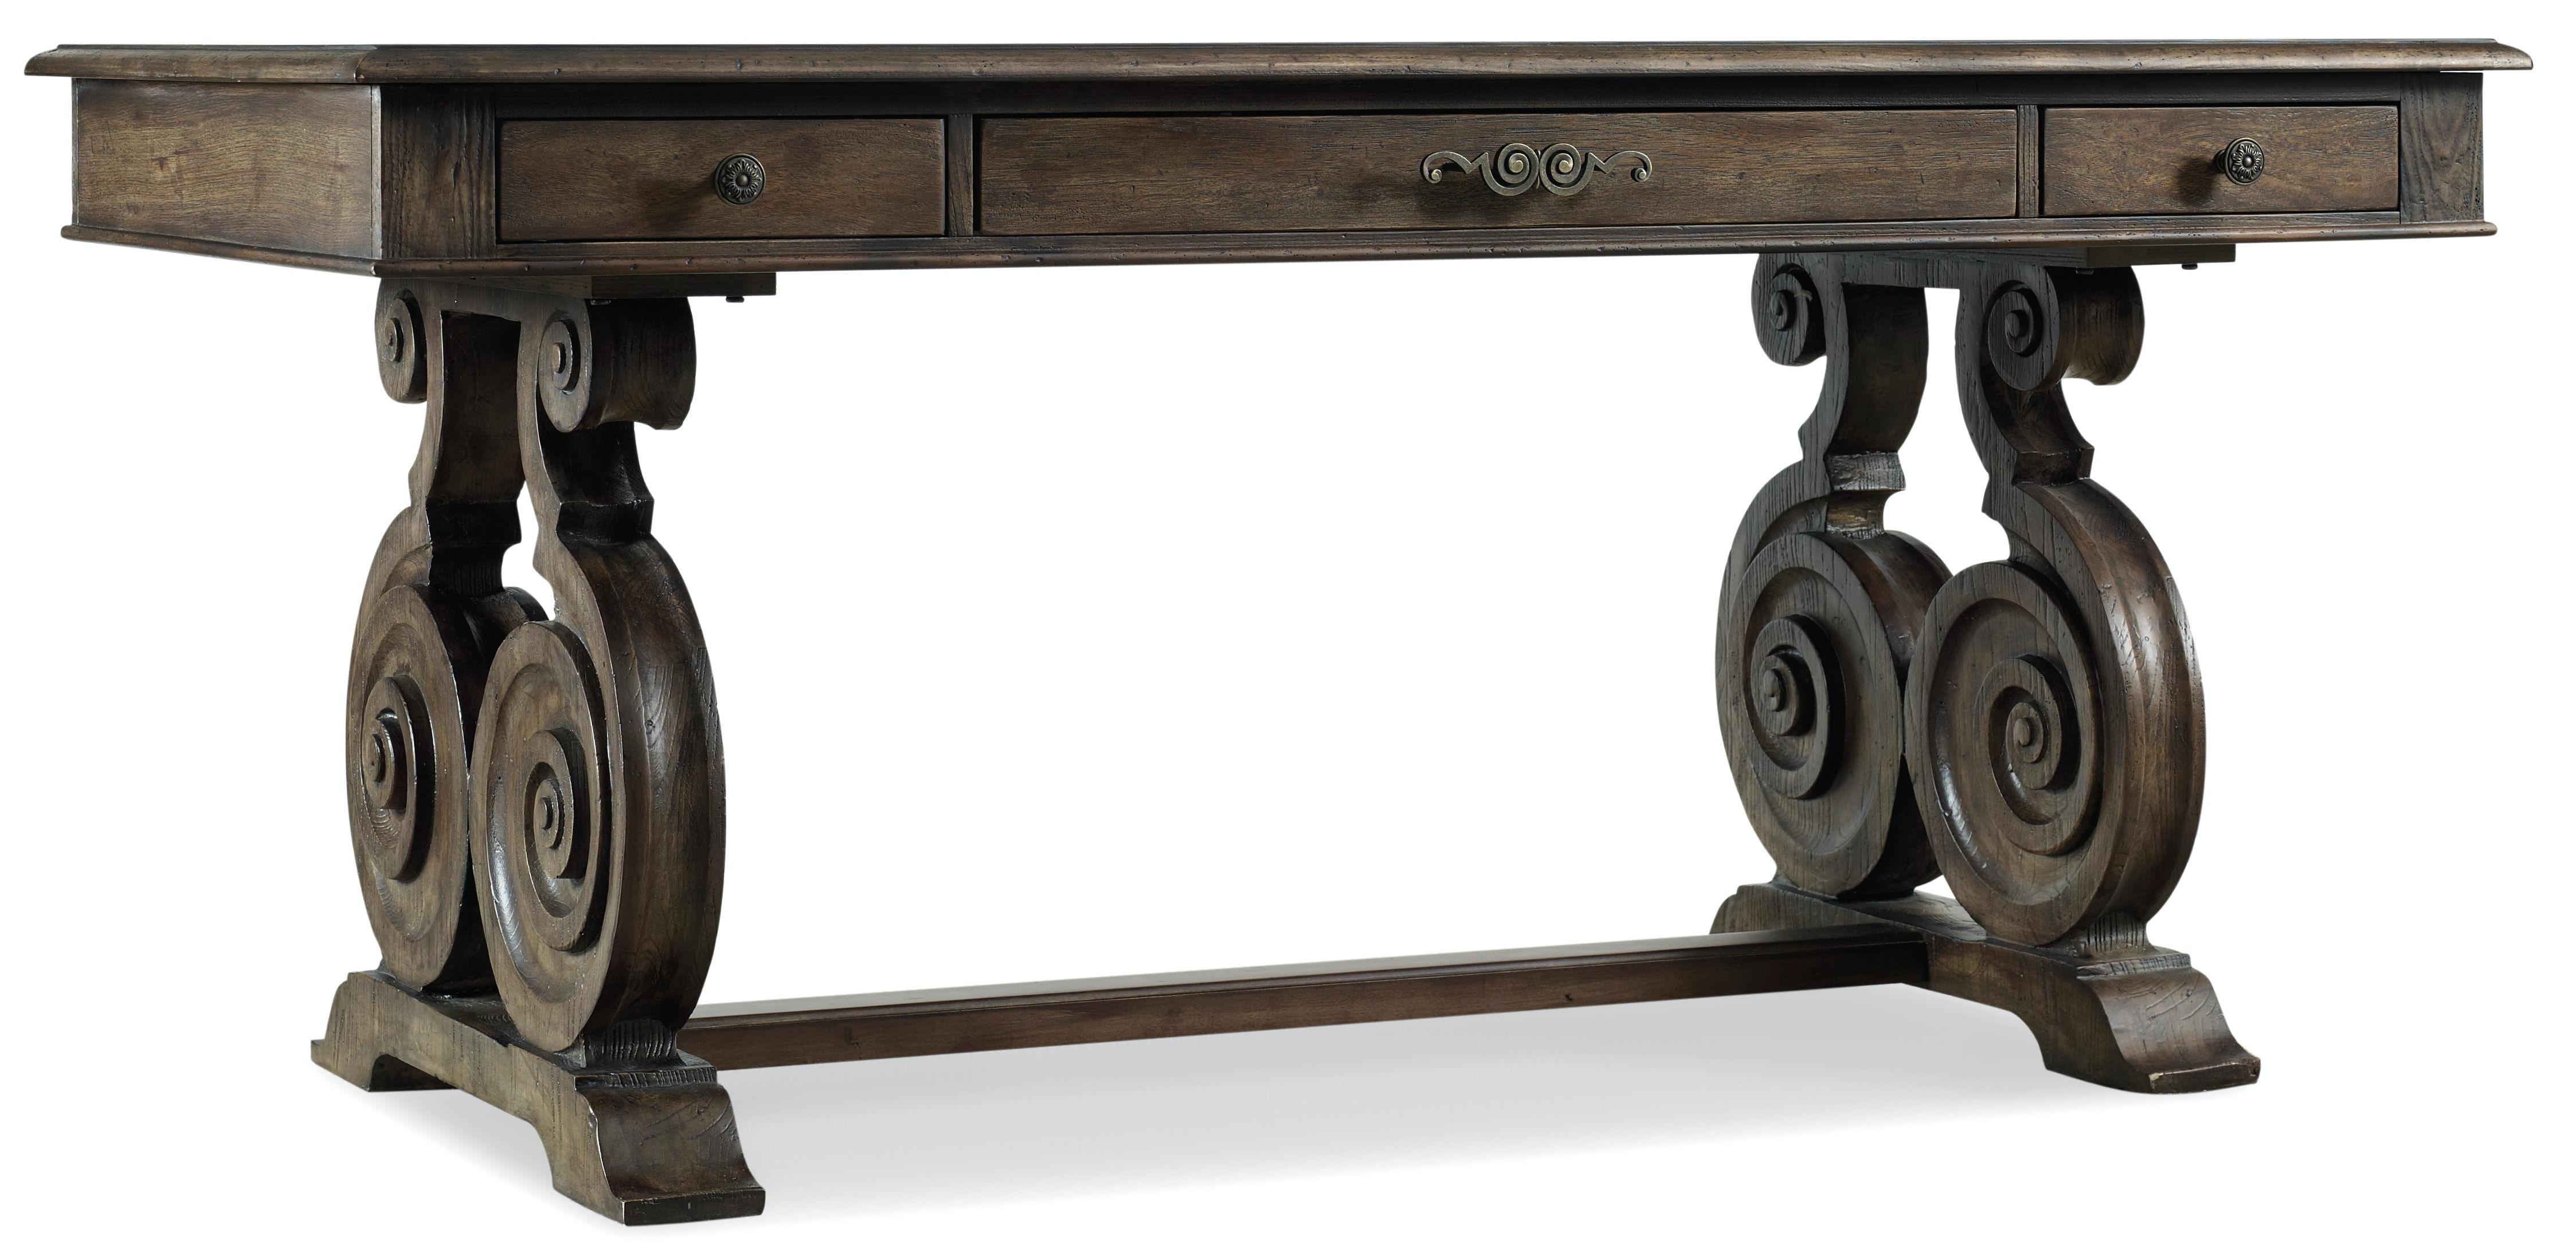 Charmant Hooker Furniture Rhapsody Writing Desk 5070 10459